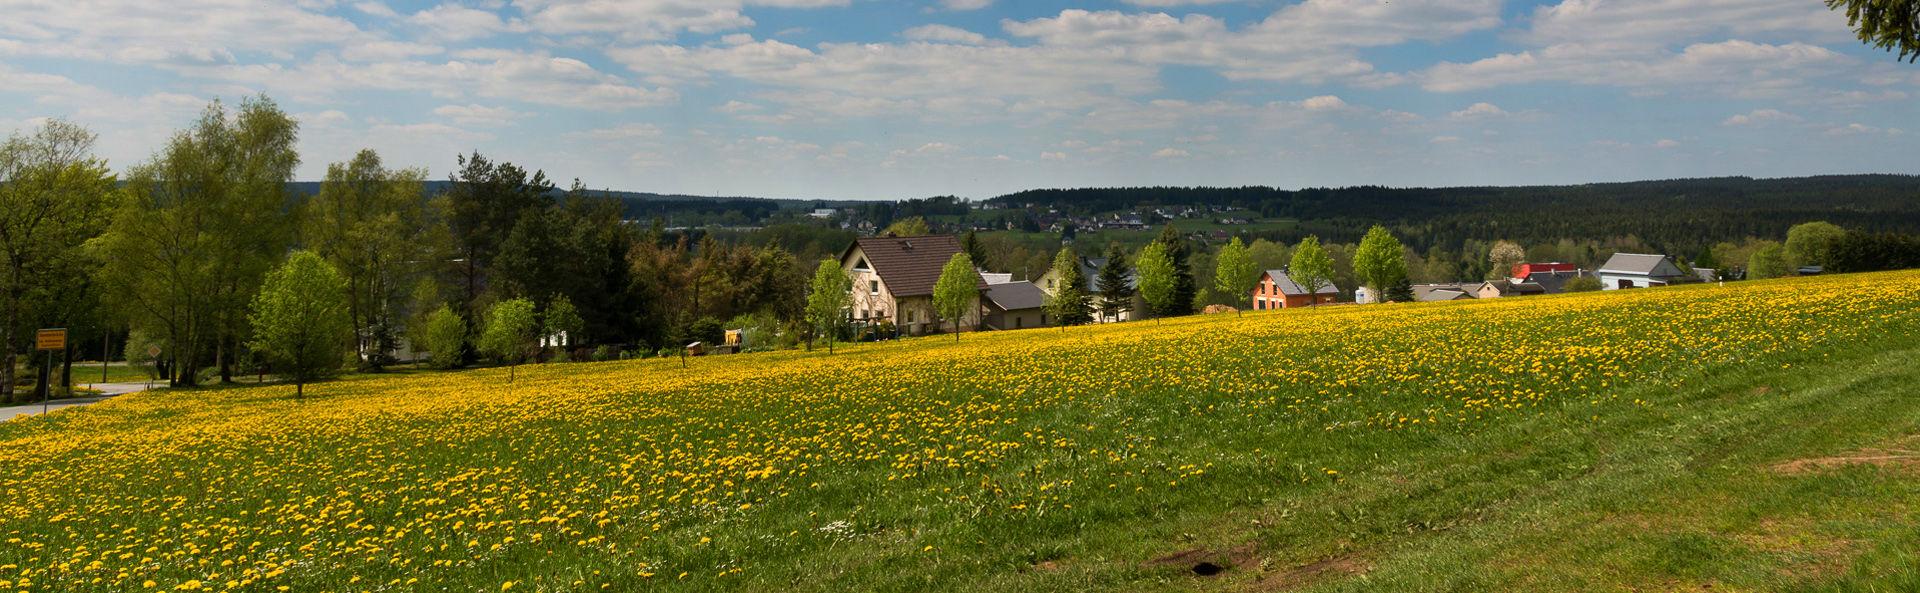 Sachsens Dörfer: Morgenröthe-Rautenkranz  © Archiv TMGS / Andreas Krone